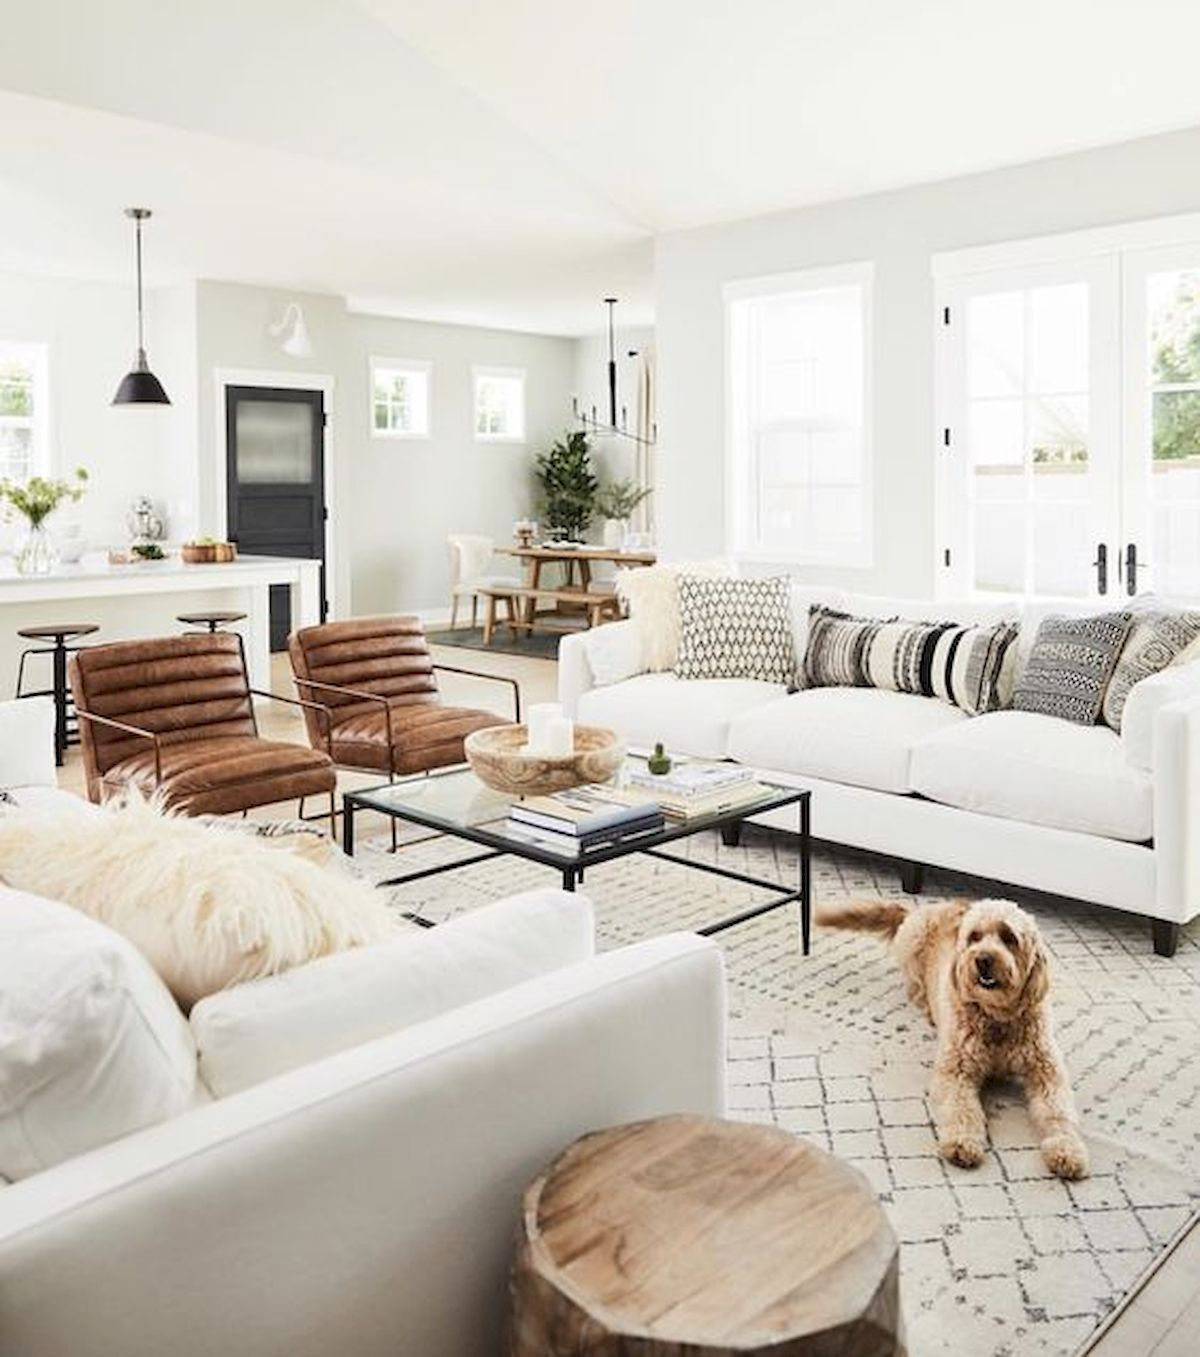 Pin by emma novak on dwelling in living room decor designs also rh pinterest